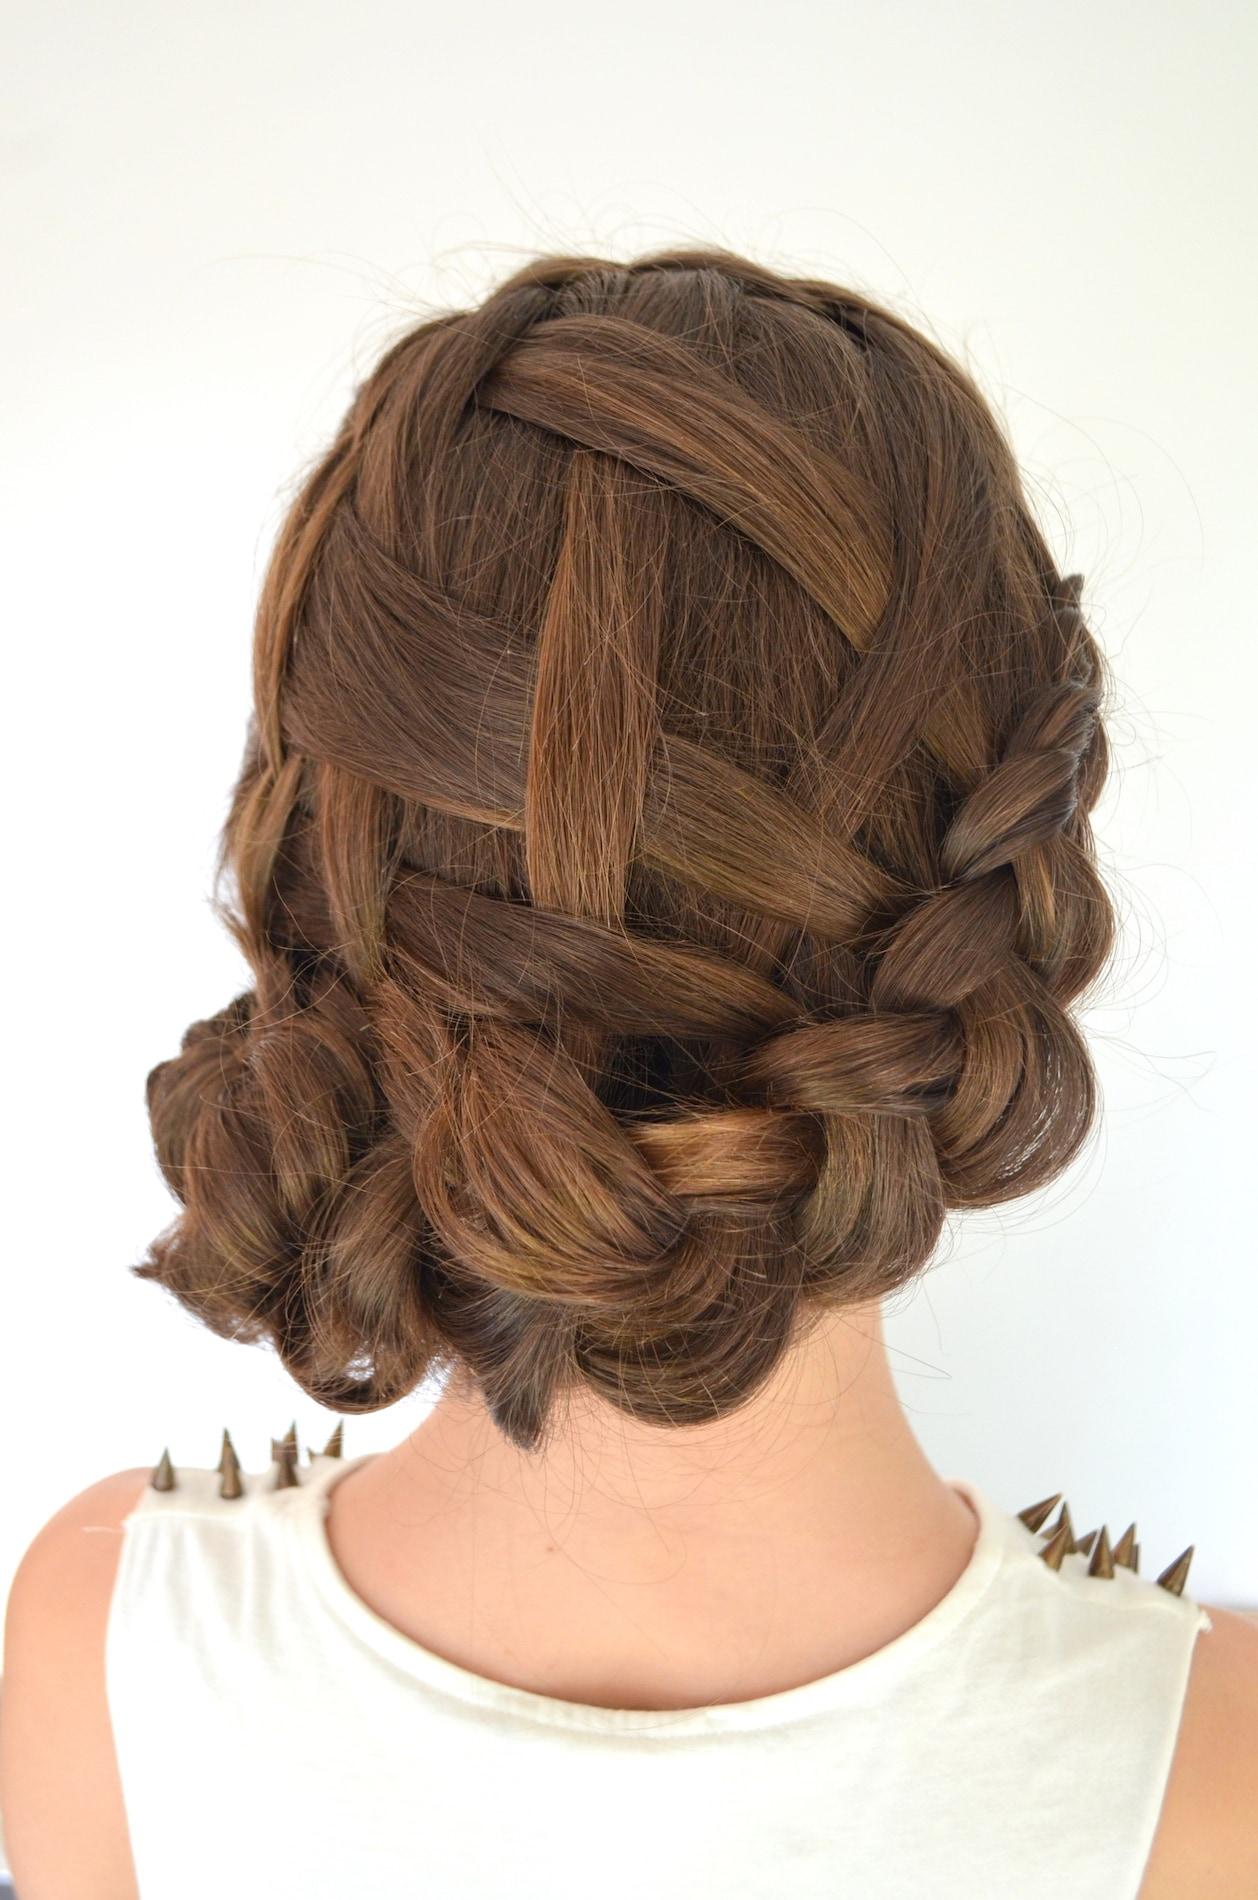 Waterfall braids dengan paduan sanggul kepang.